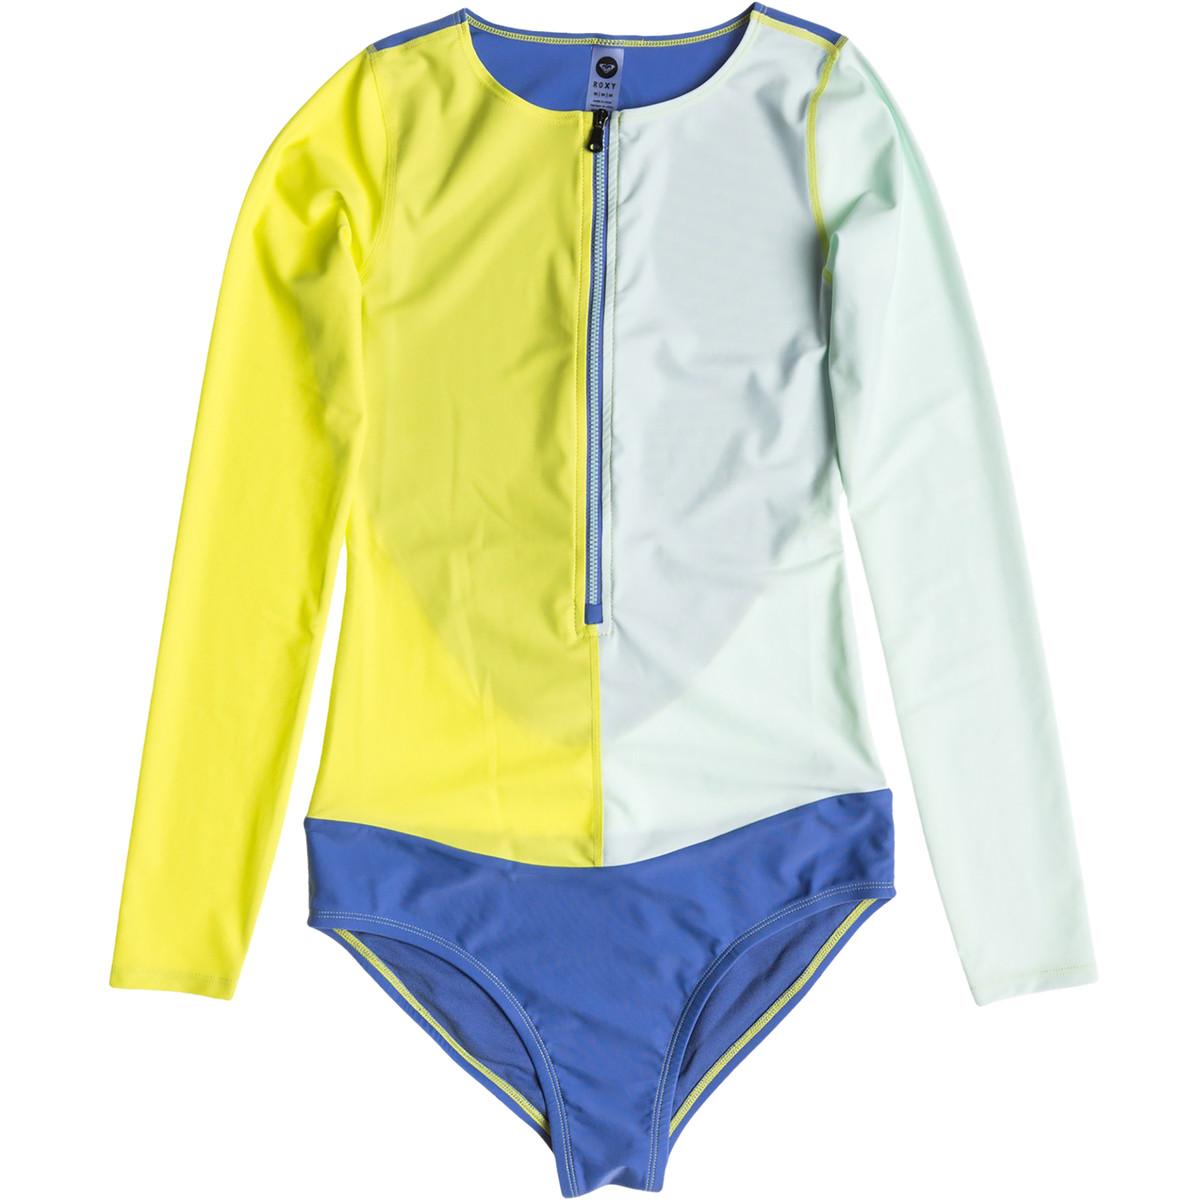 Roxy High Line Rashguard Suit